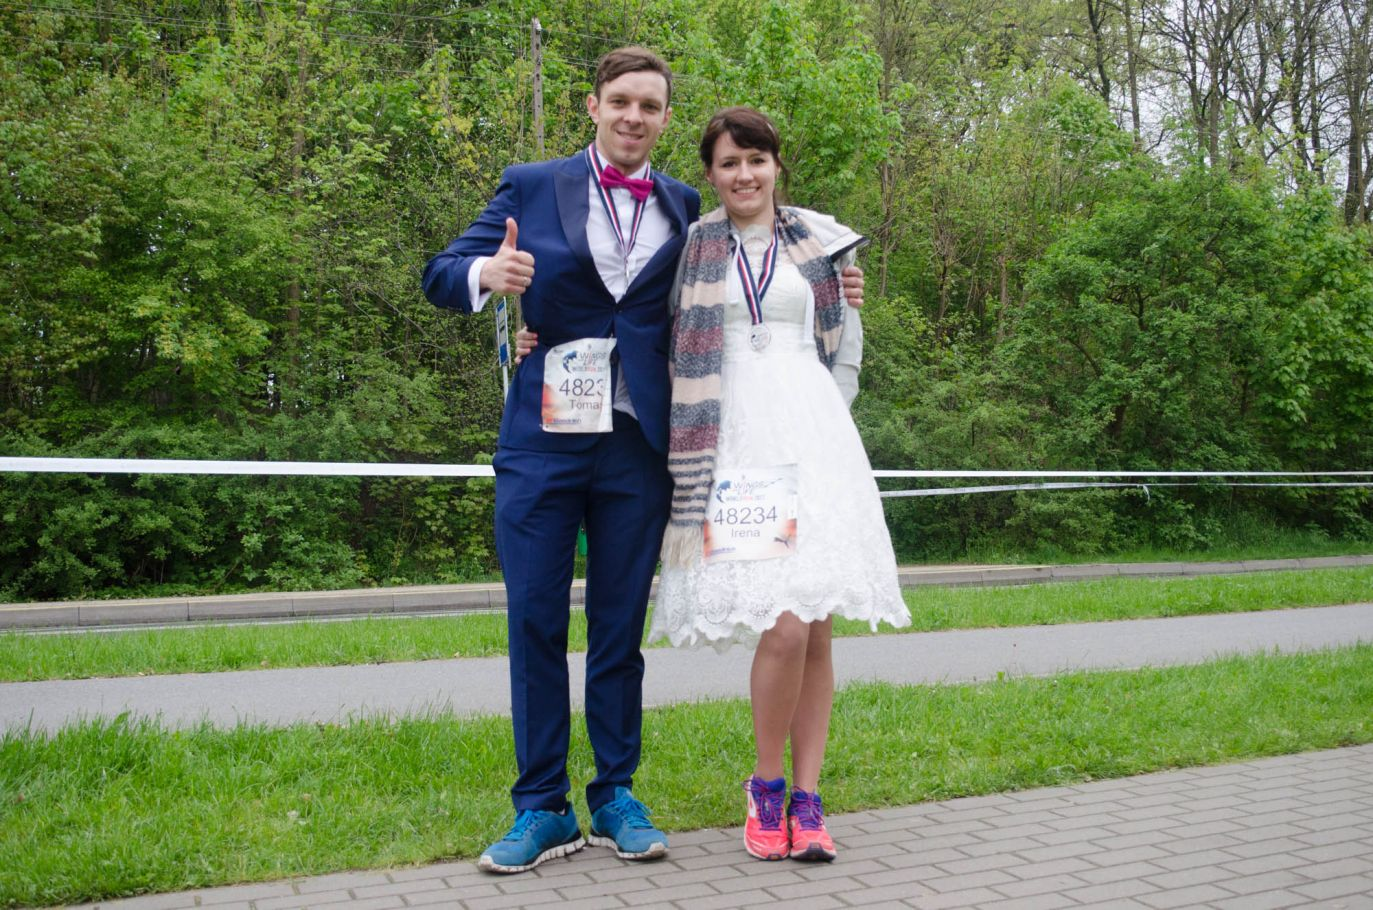 (fot. tvp.info/Katarzyna Puciłowska)